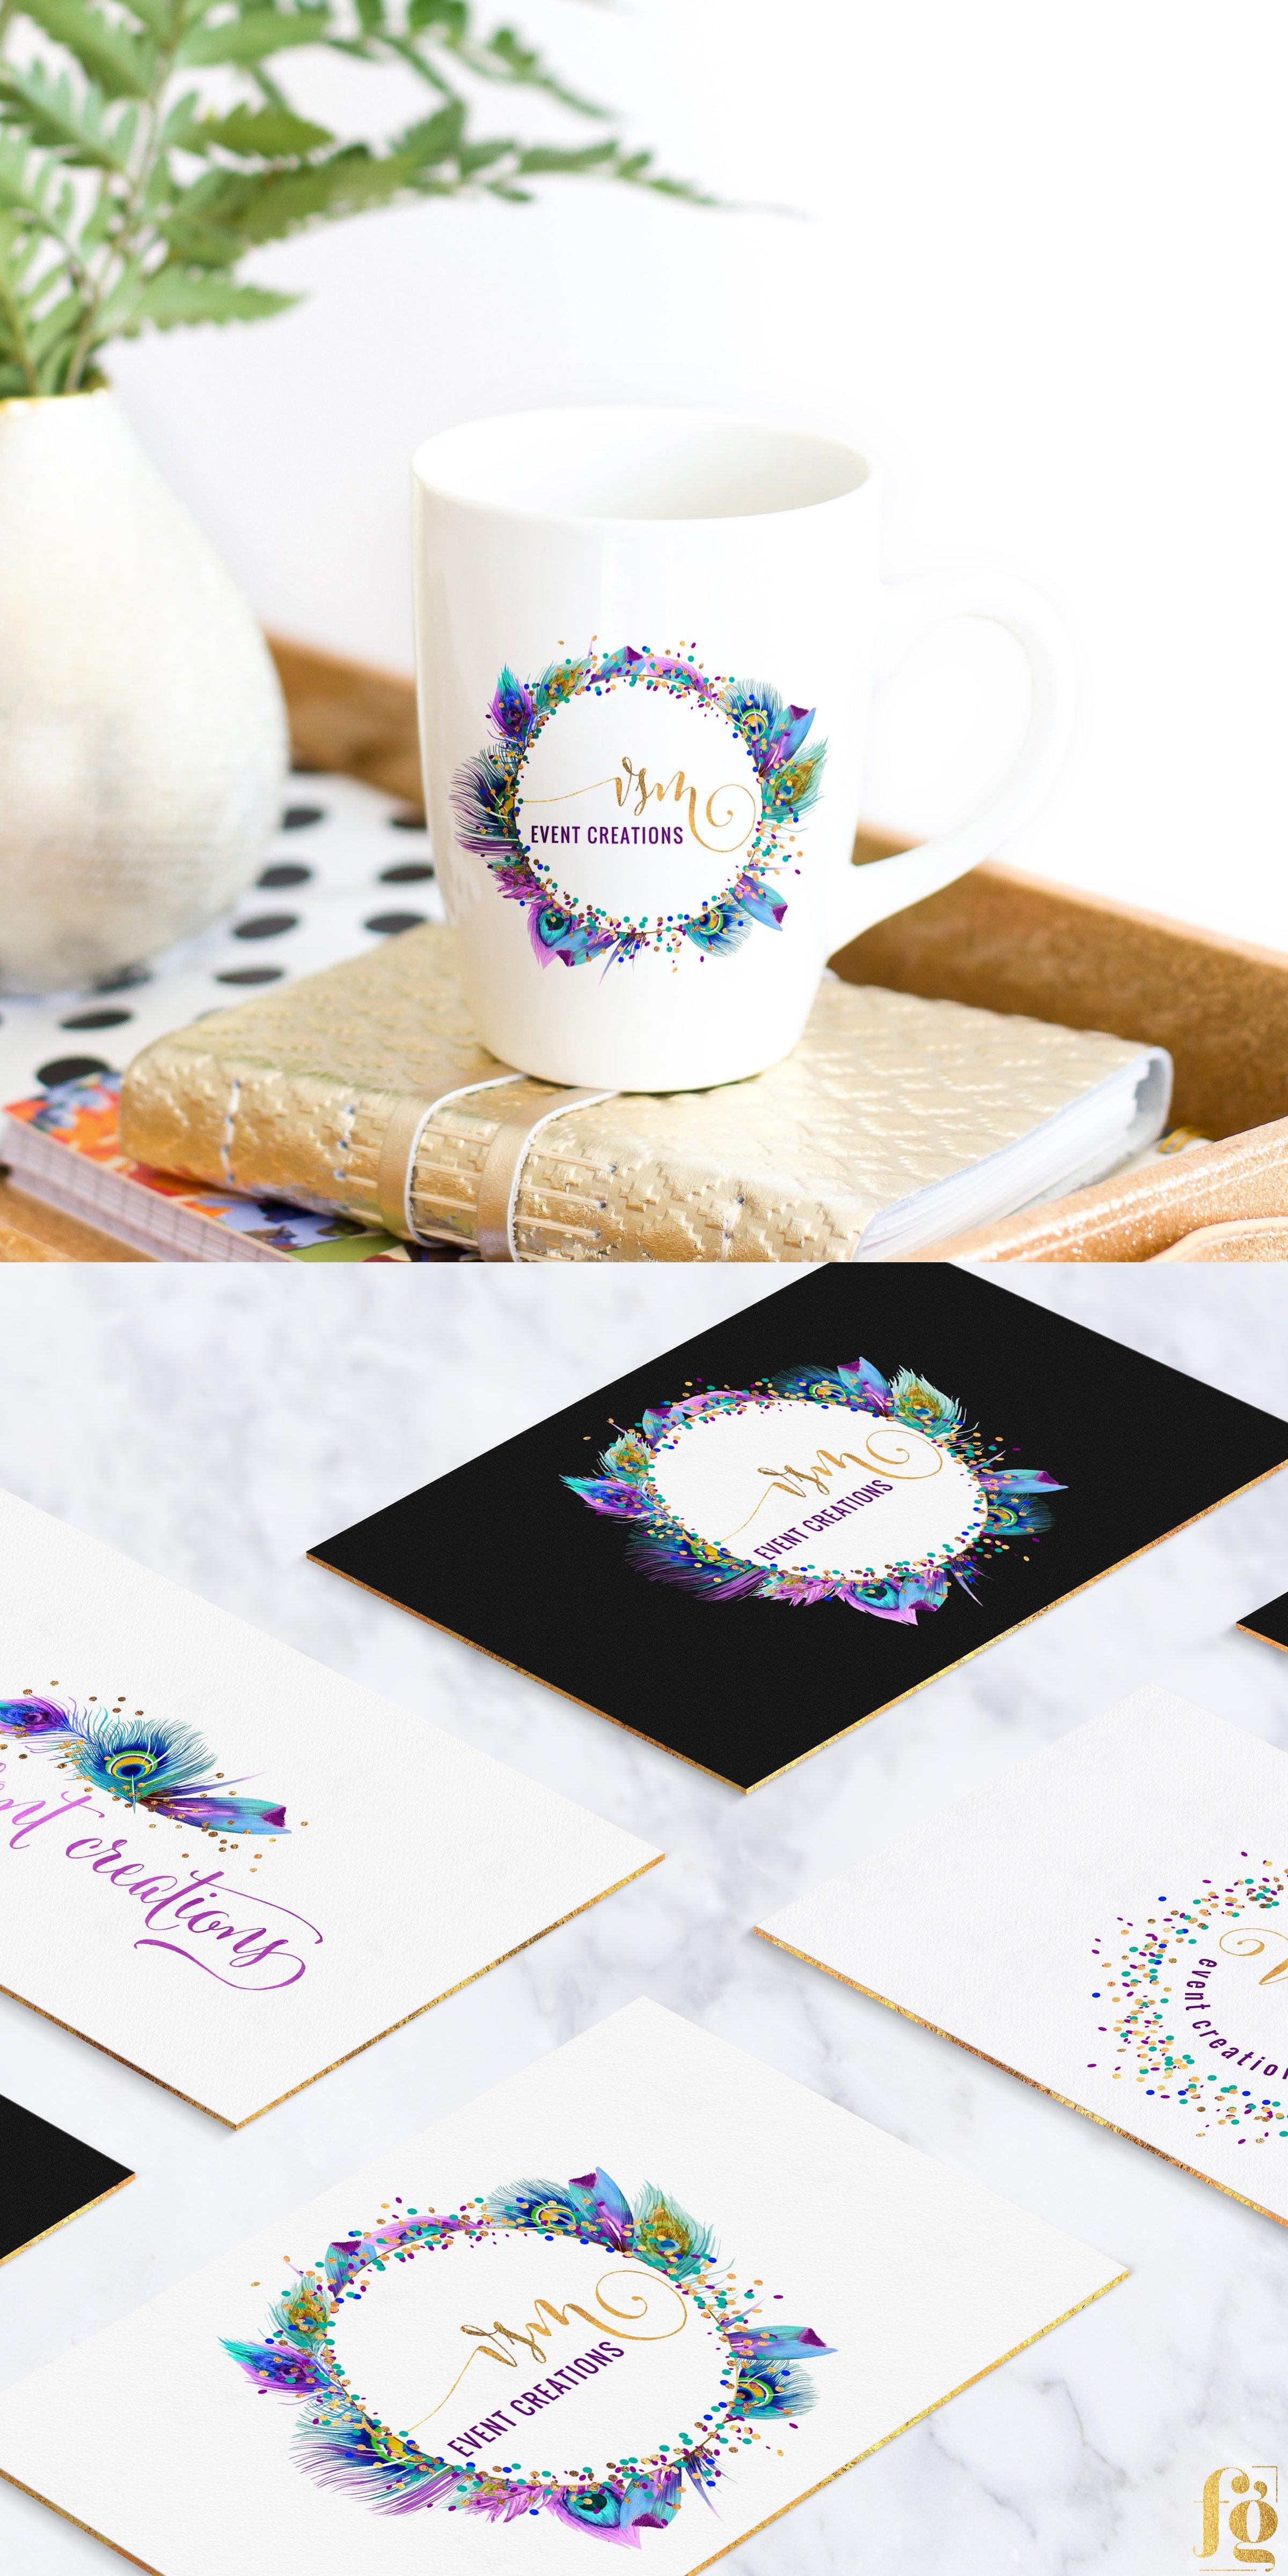 logo display mockup for VSM Event Creations by Fancy Girl Design Studio